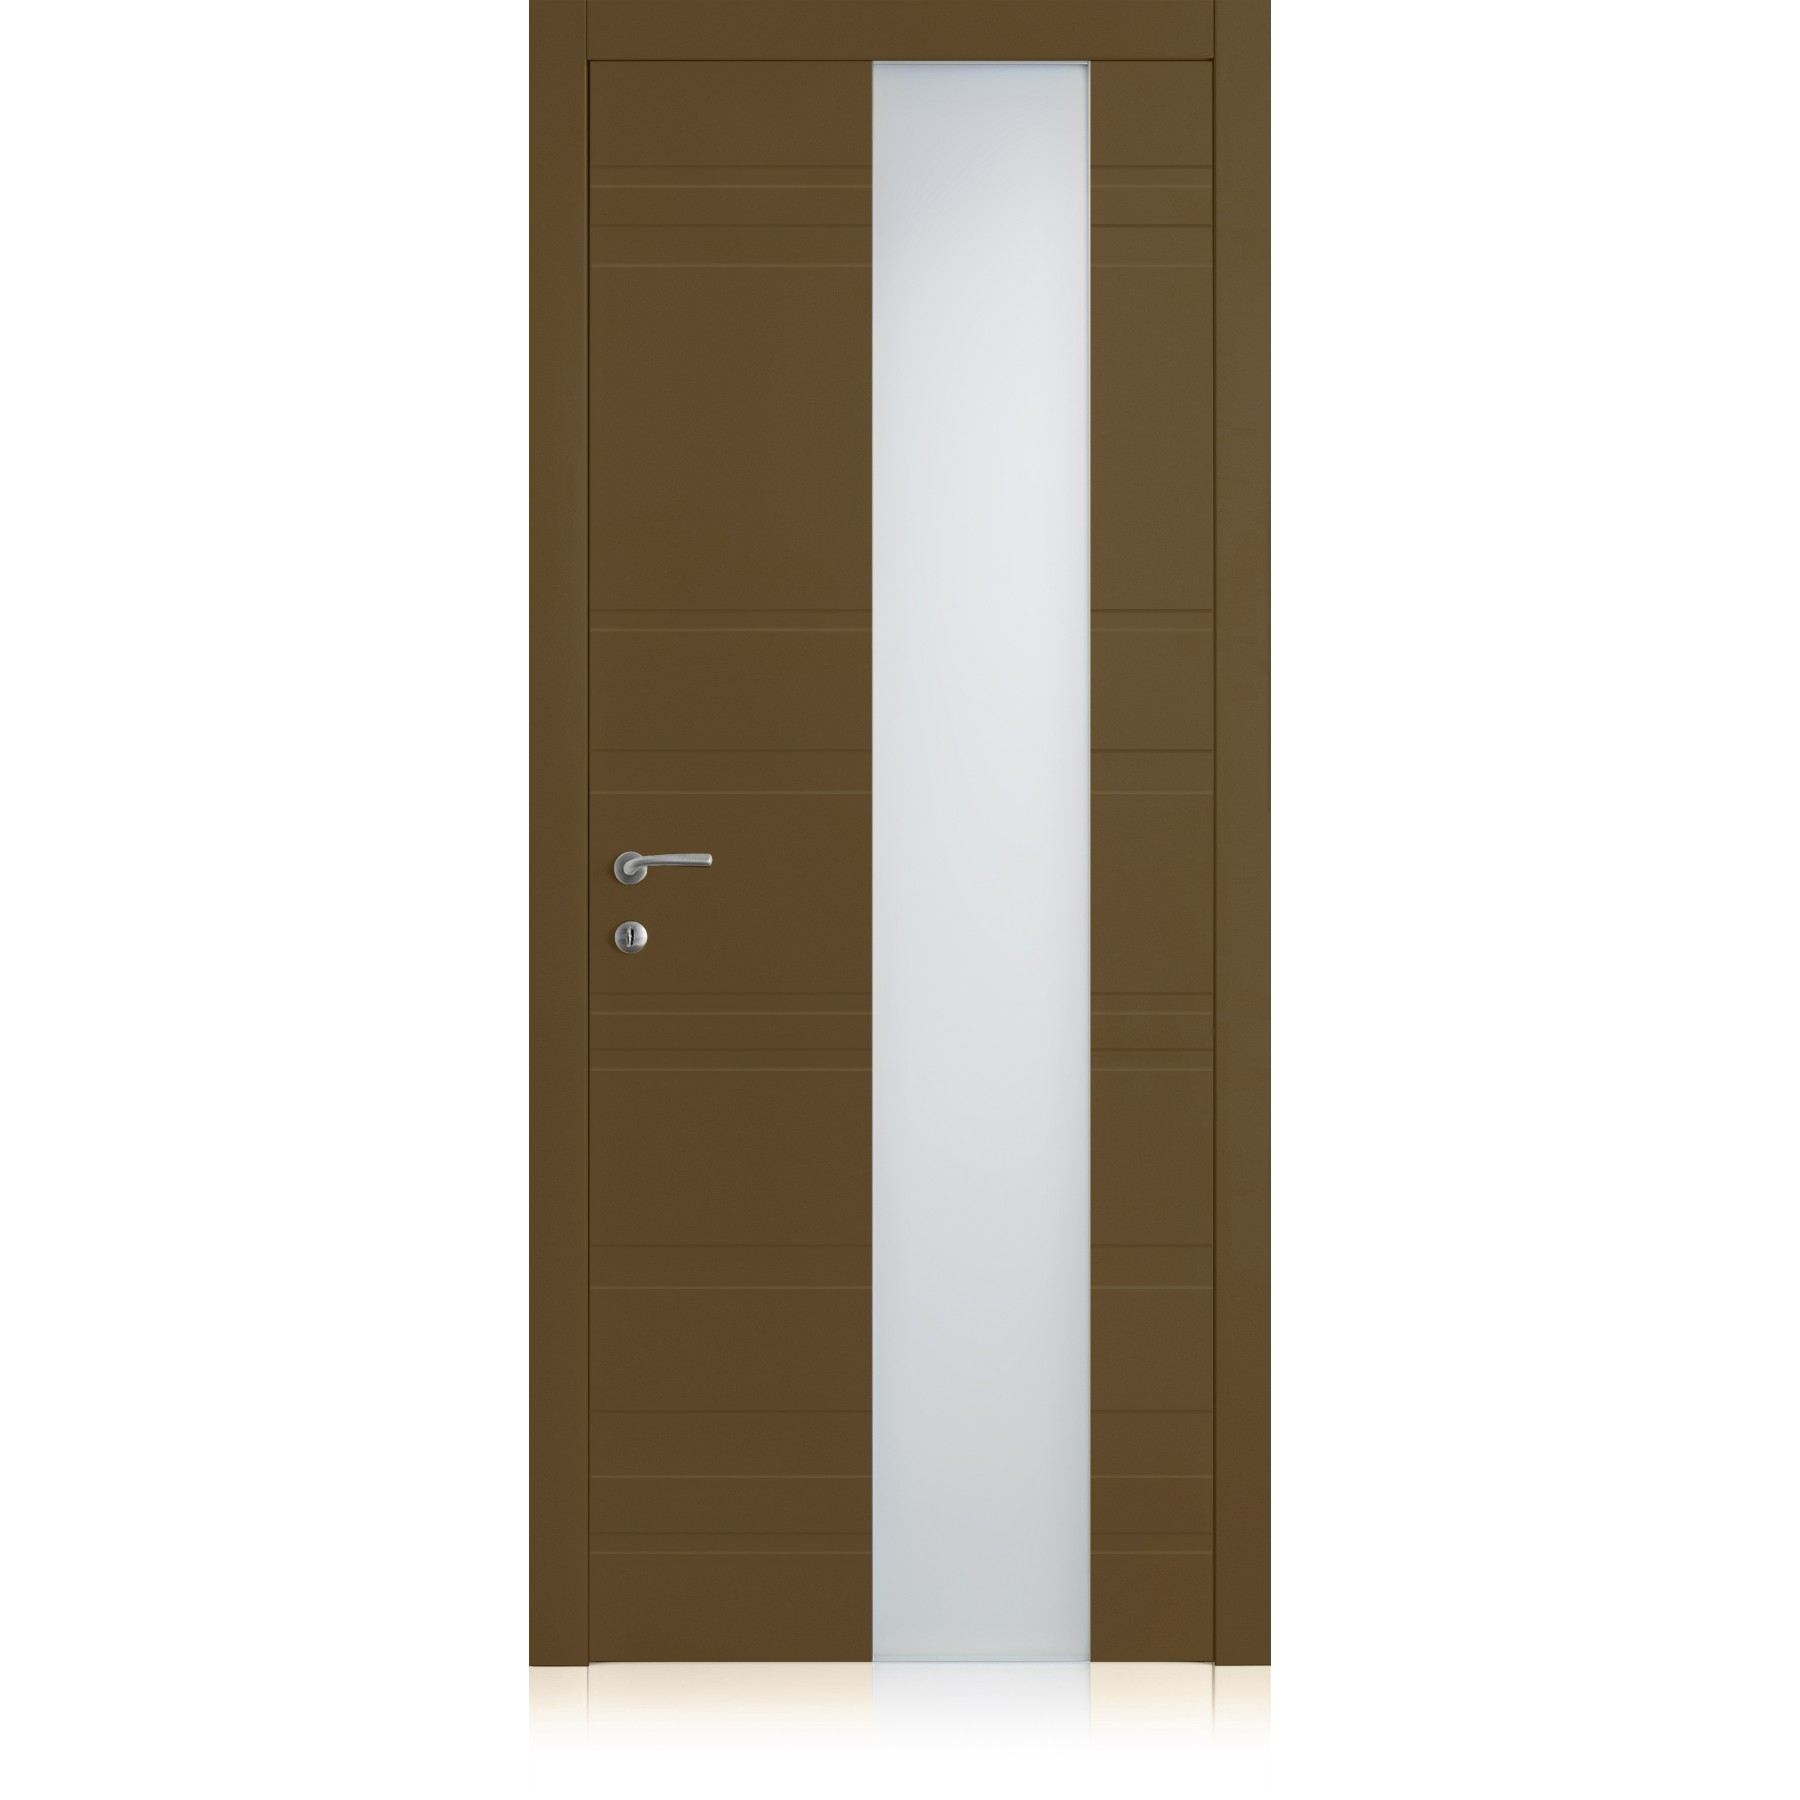 Yncisa Styla Vetro Terra Pure Laccato ULTRAopaco door